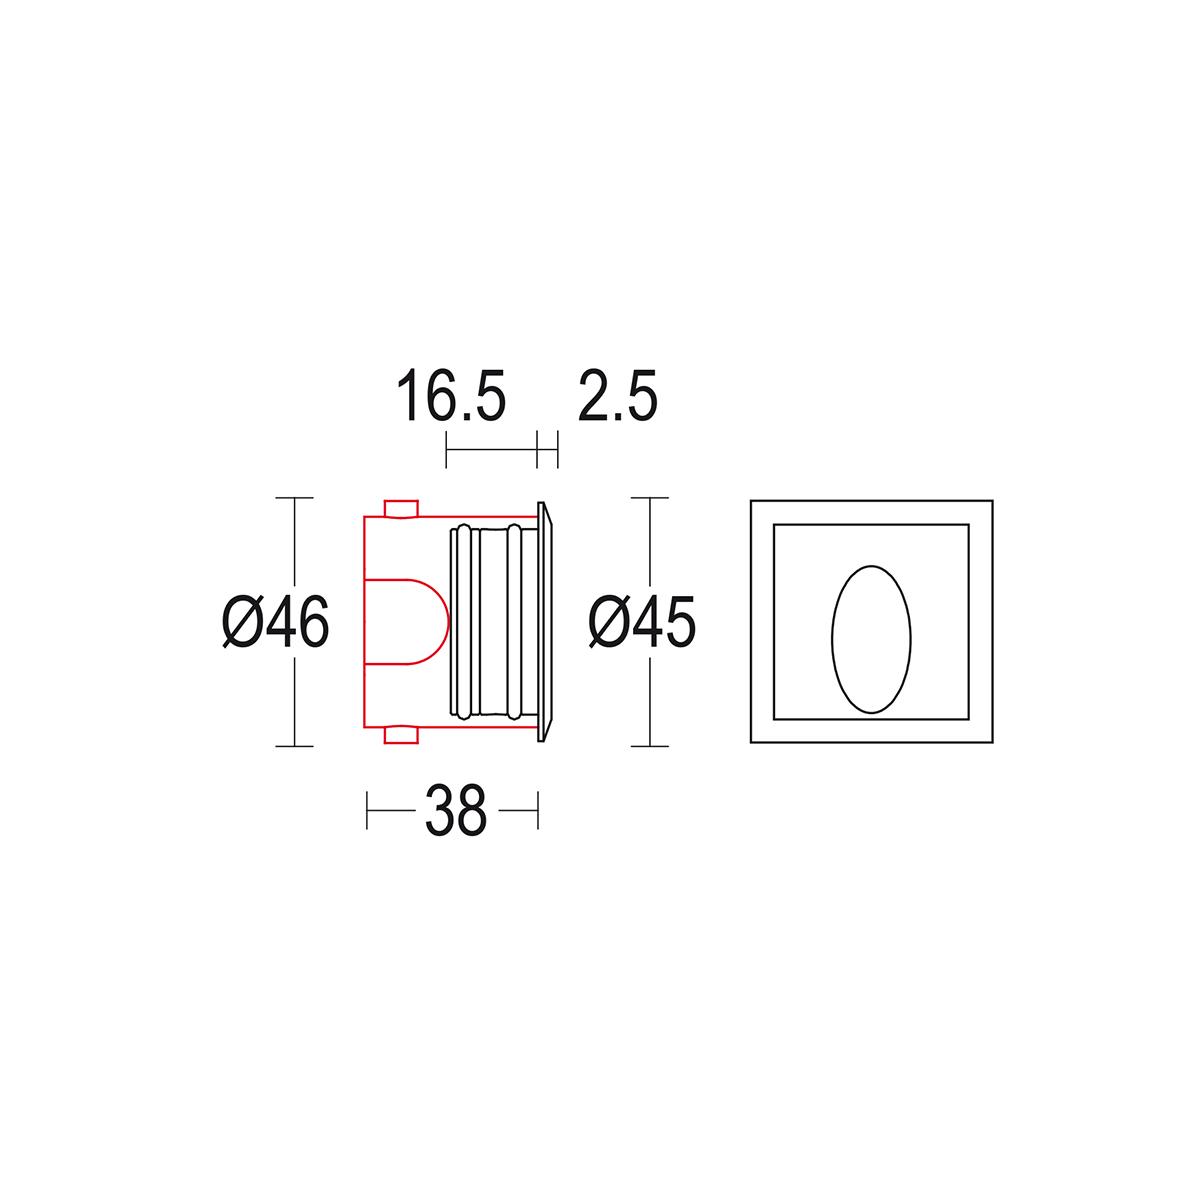 чертеж Segno AS 45 Ghidini уличный светильник GH1440.BAXO300EC